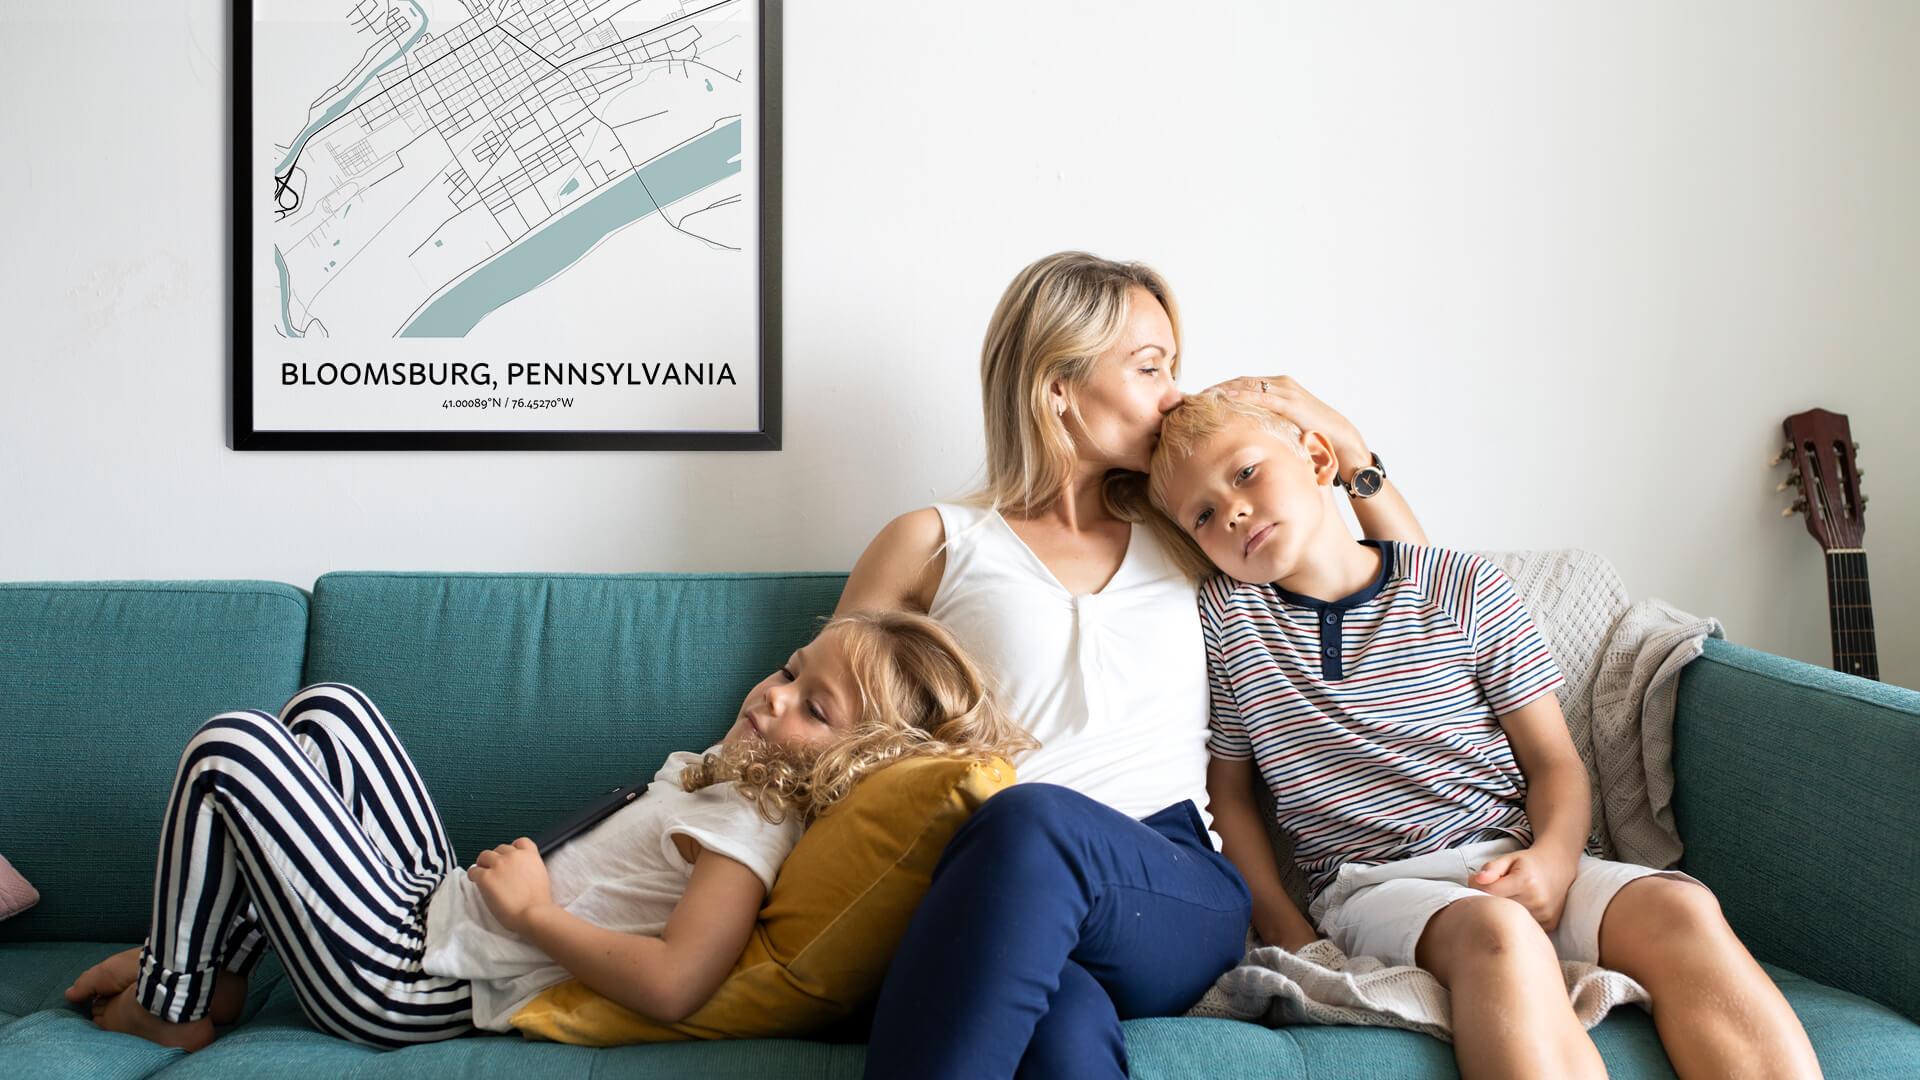 Bloomsburg map poster